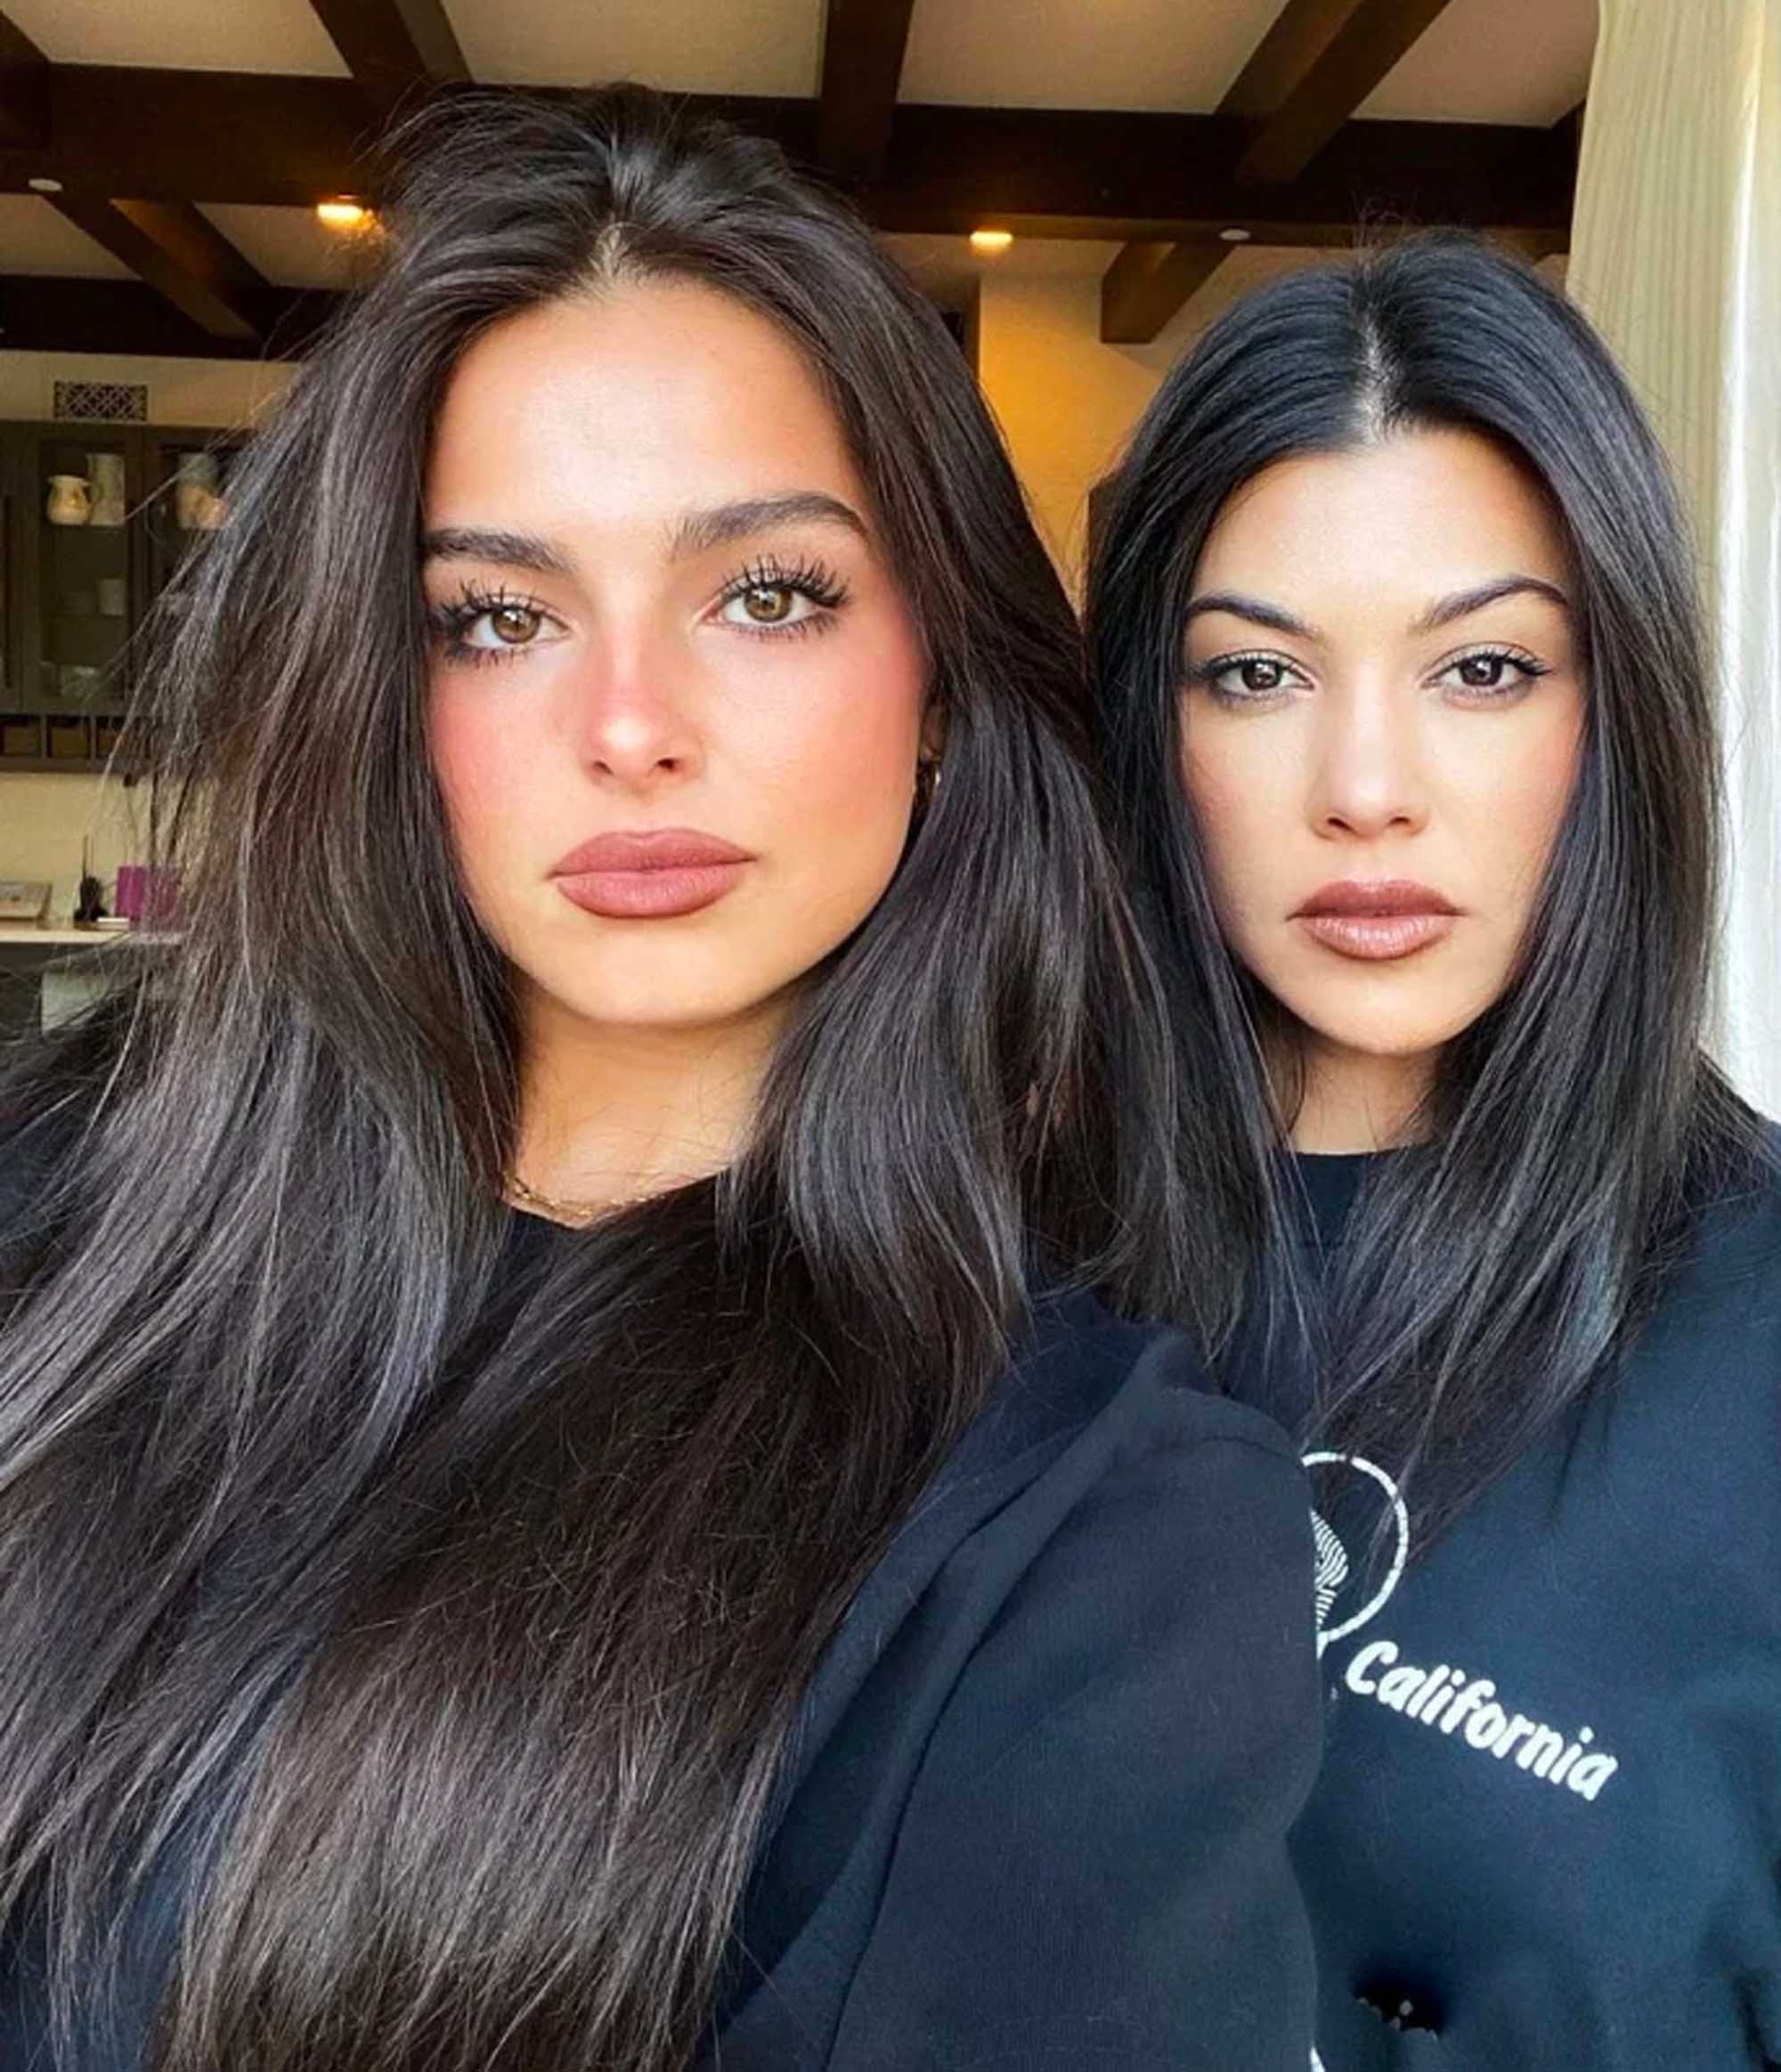 Addison Rae og Kourtney Kardashian (Instagram/addisonraee)